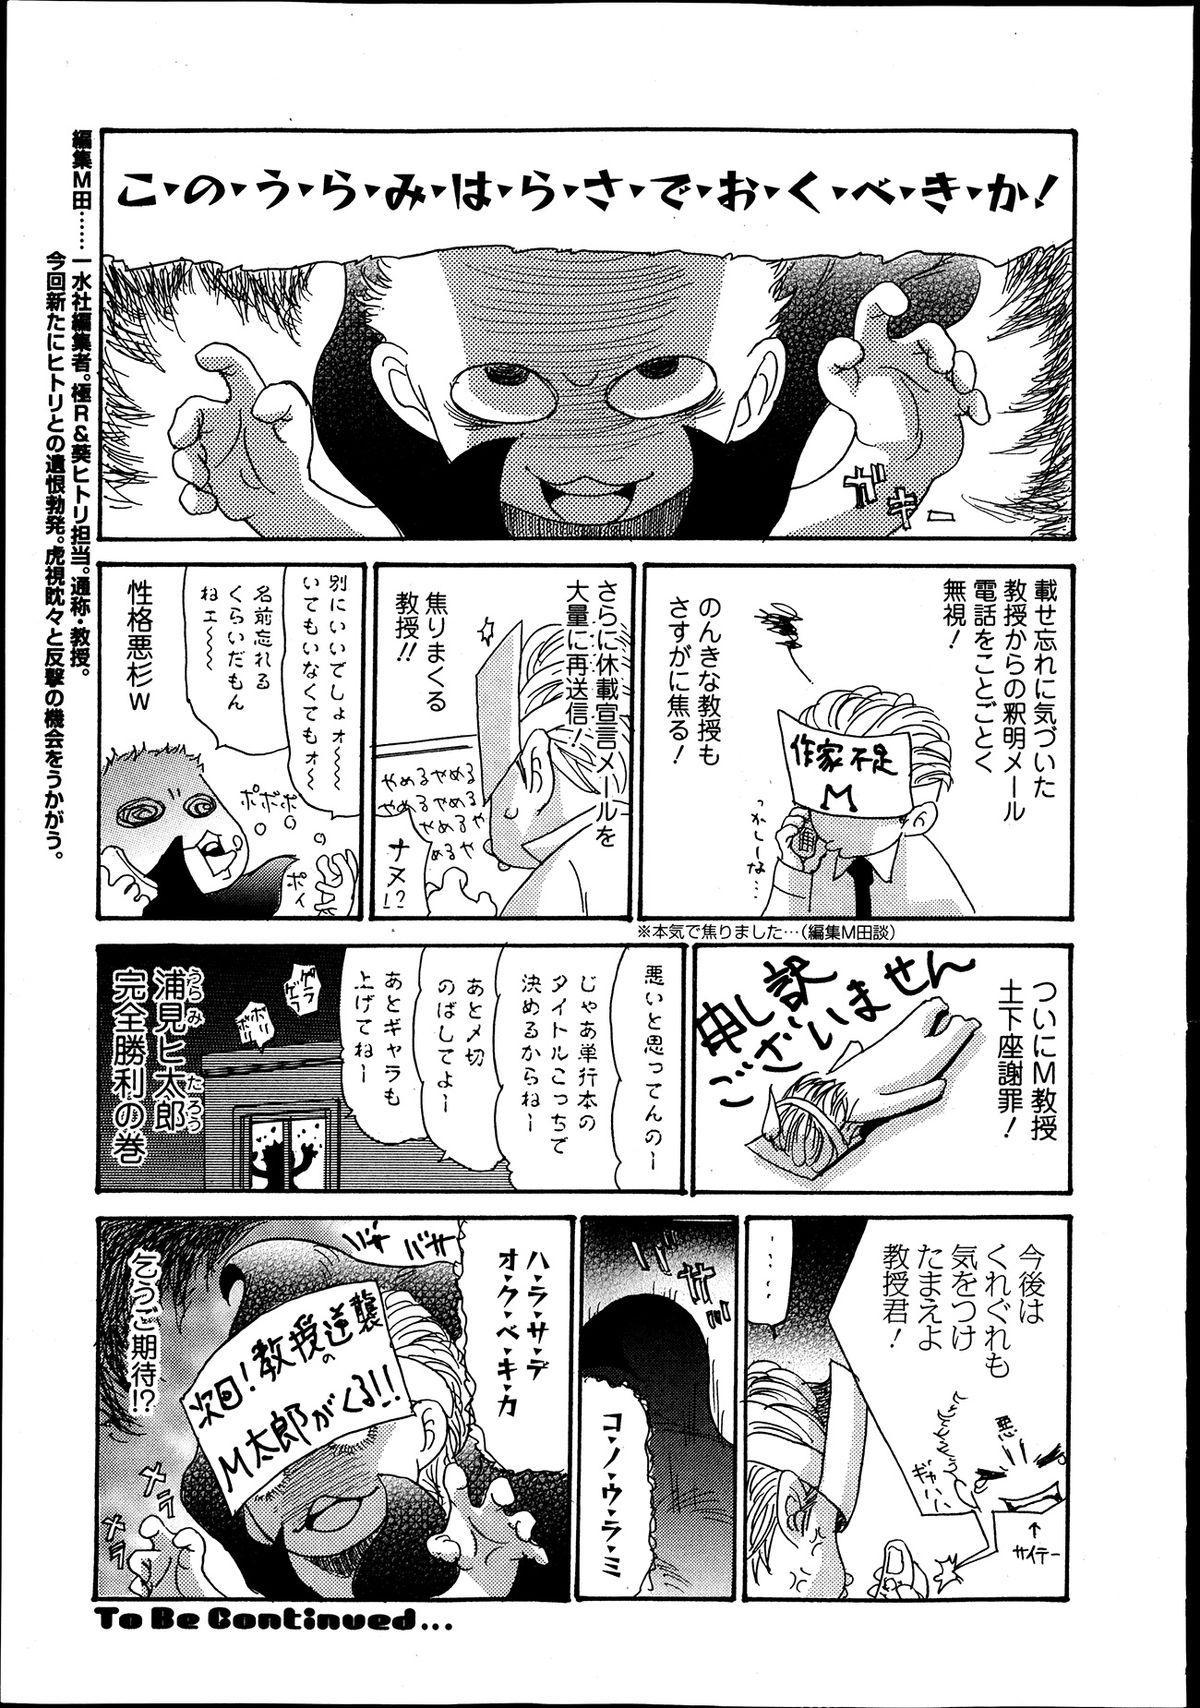 Bishoujo Kakumei KIWAME Road Vol.9 252